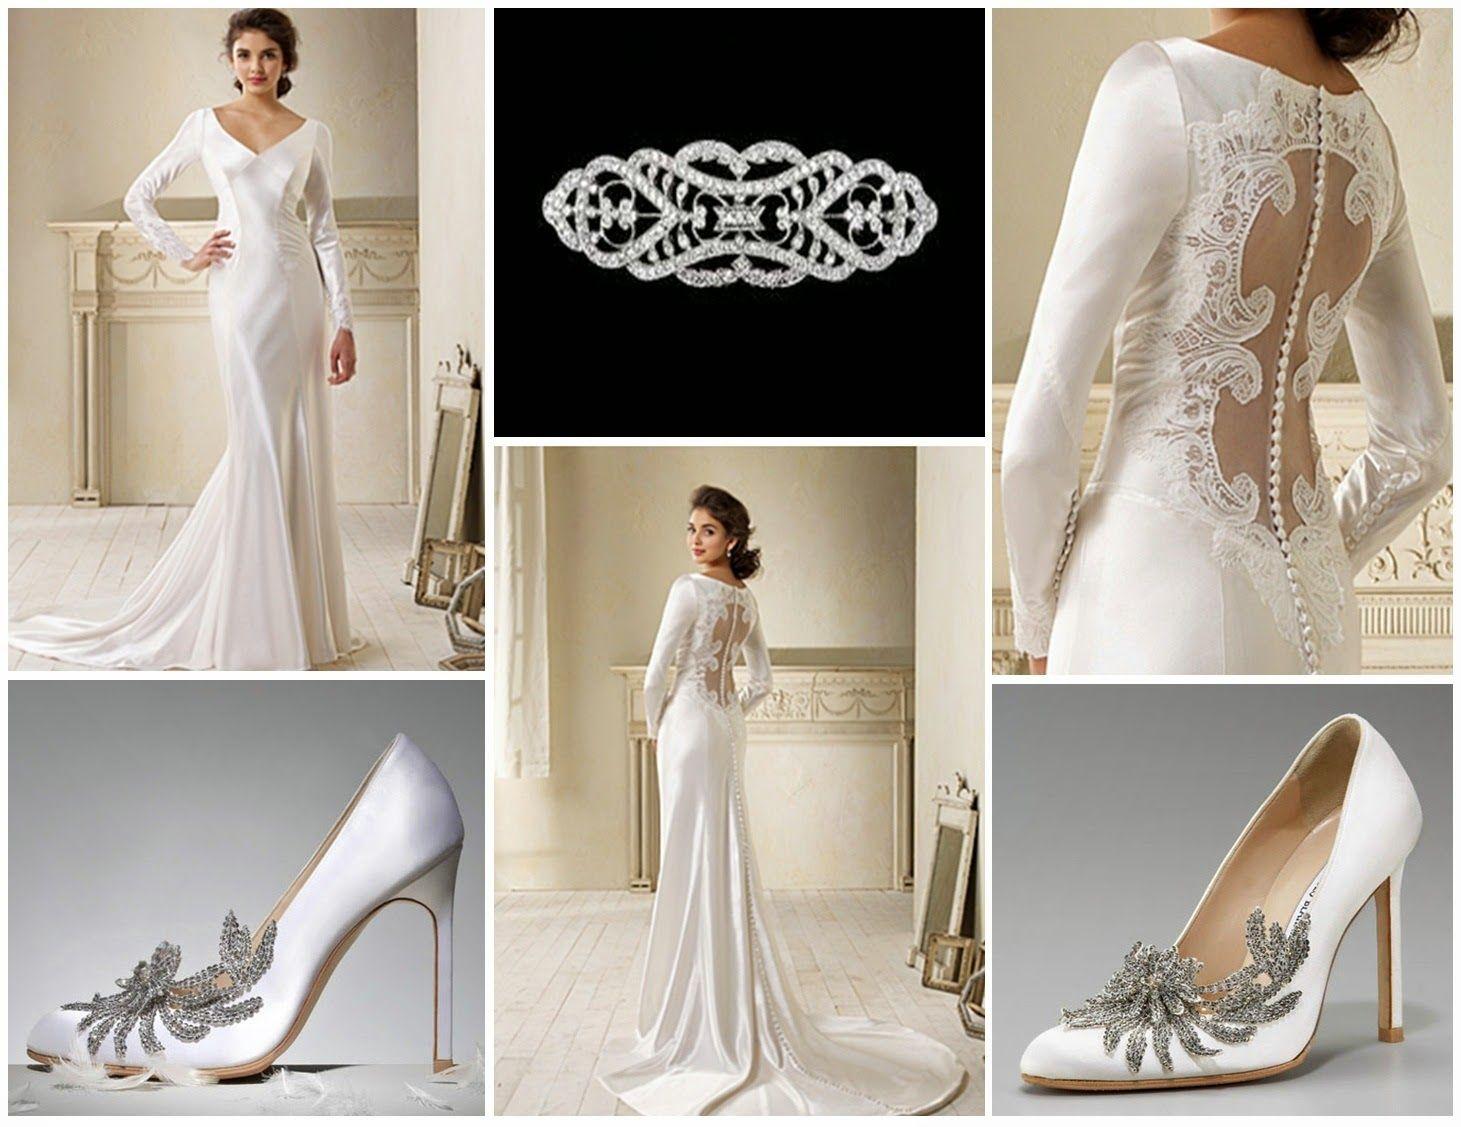 Breaking Dawn Bella Swan Wedding Dress Look Alike Bella Swan Wedding Dress Bella Wedding Dress Twilight Wedding Dresses